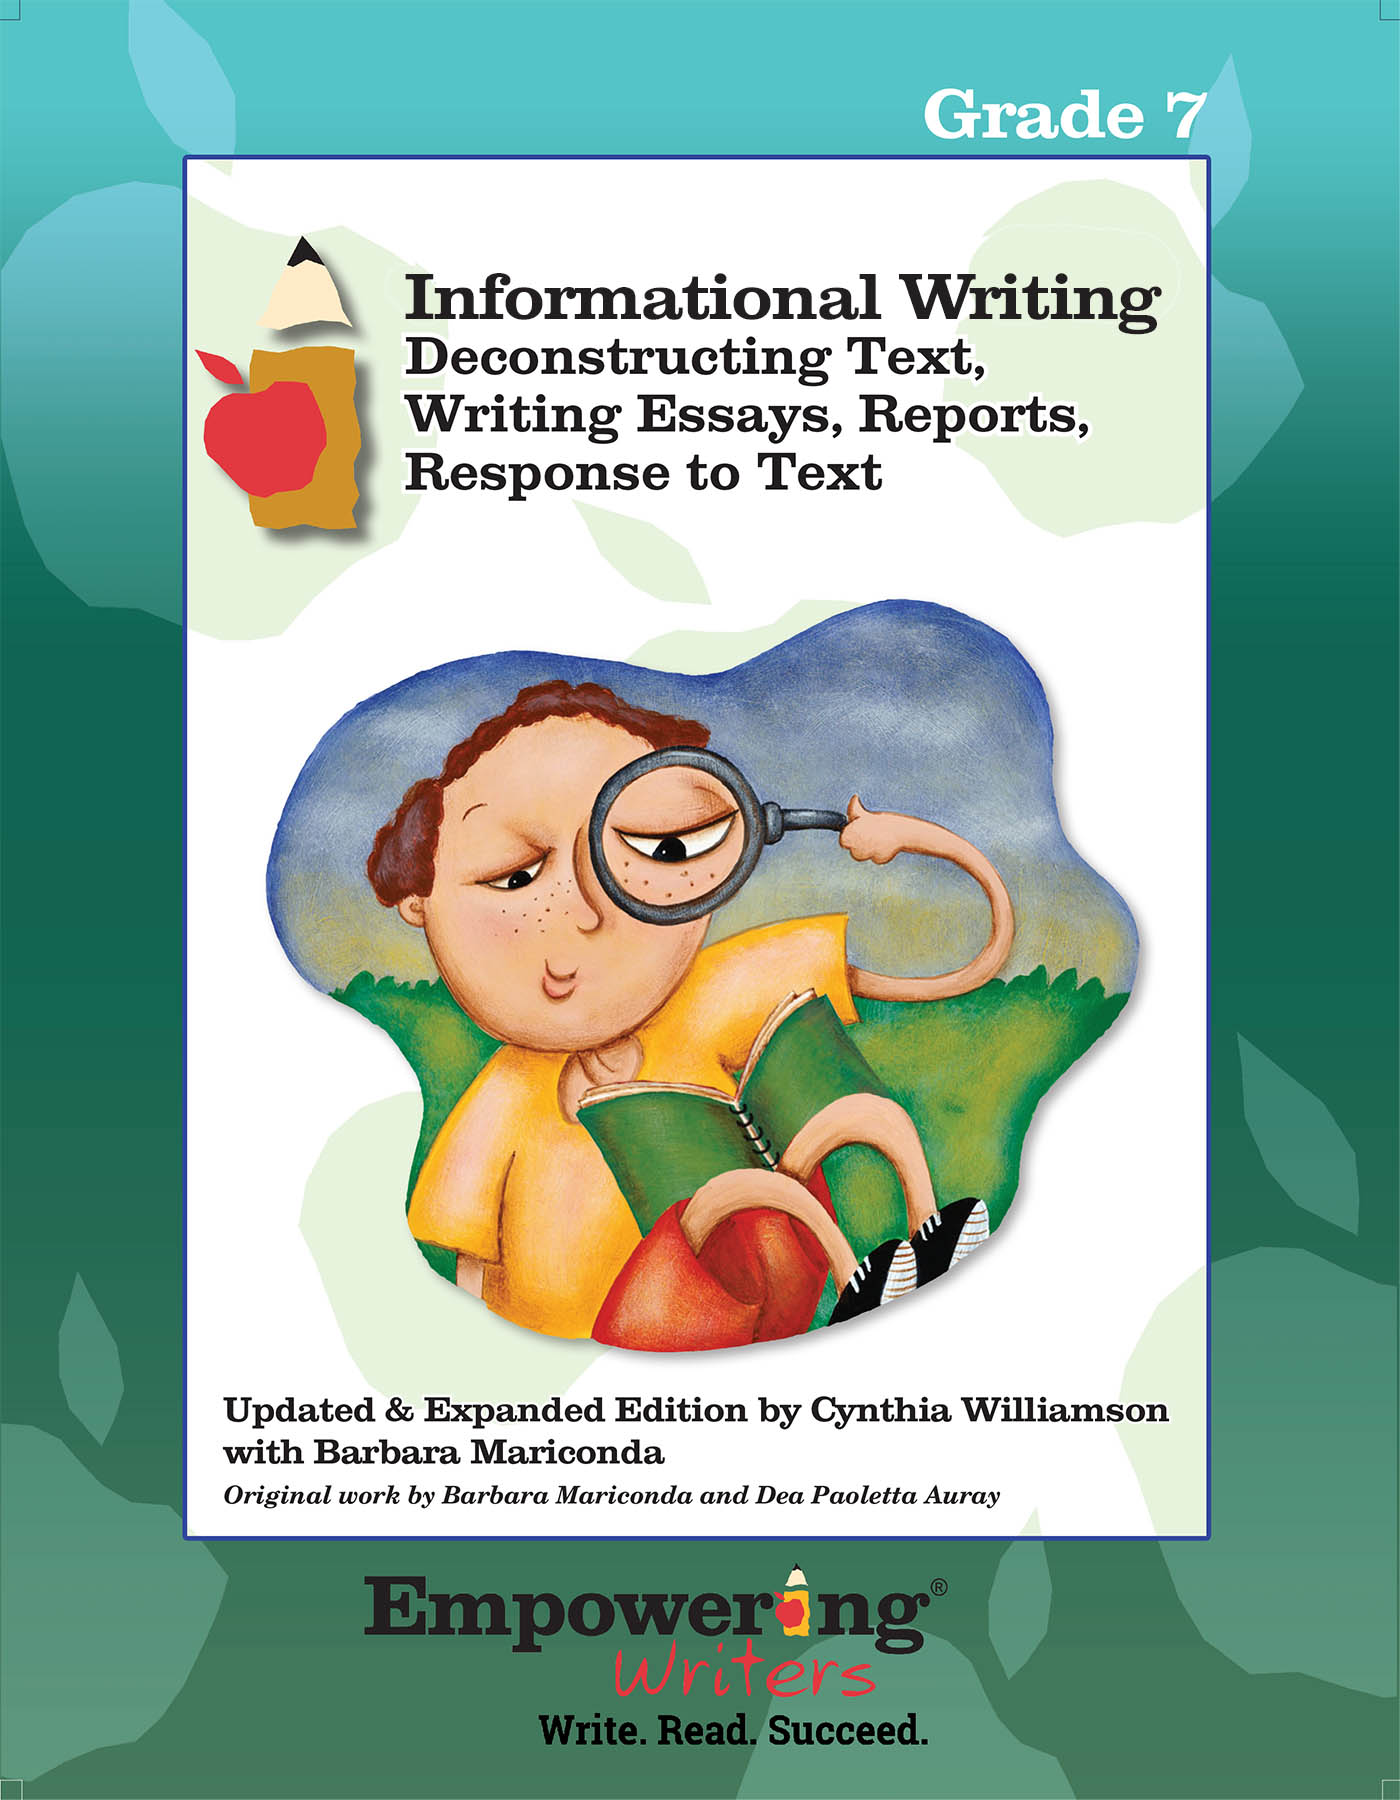 Grade 7 Informational Guide Covers New Logo 5.18.18-1 copy